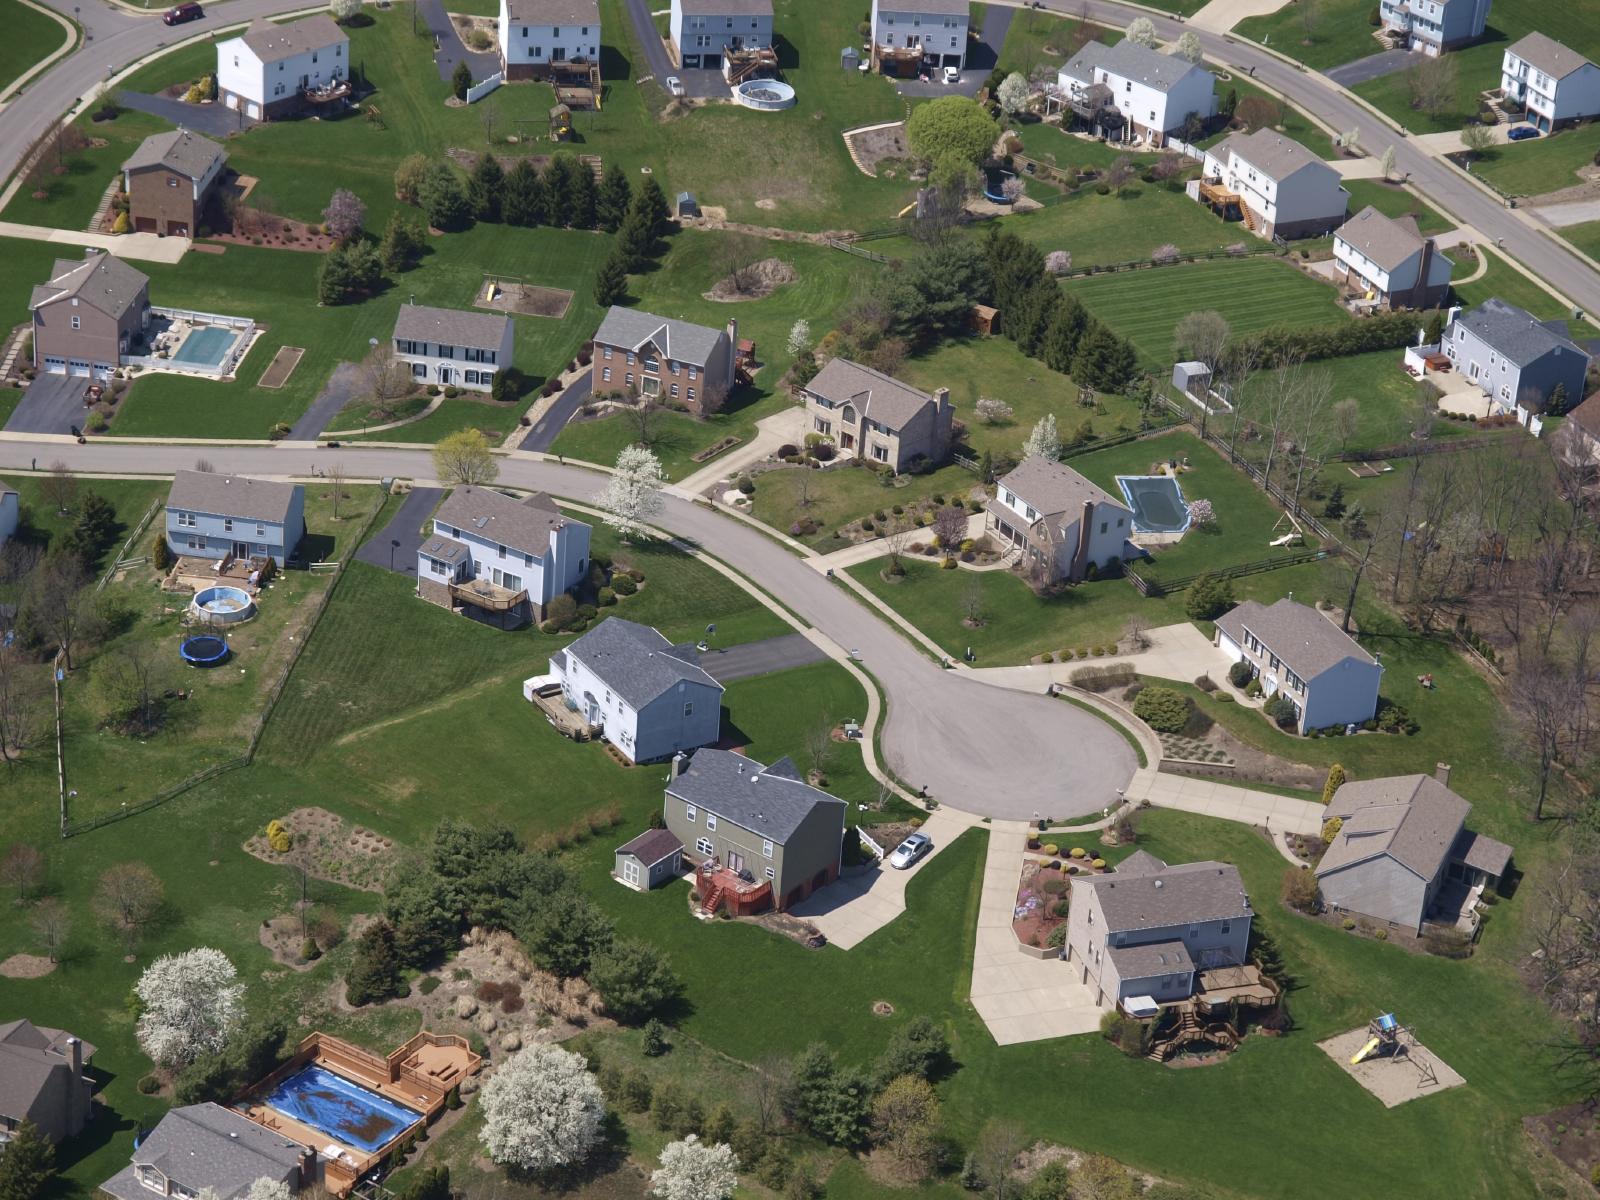 Stock aerial photo of a neighborhood